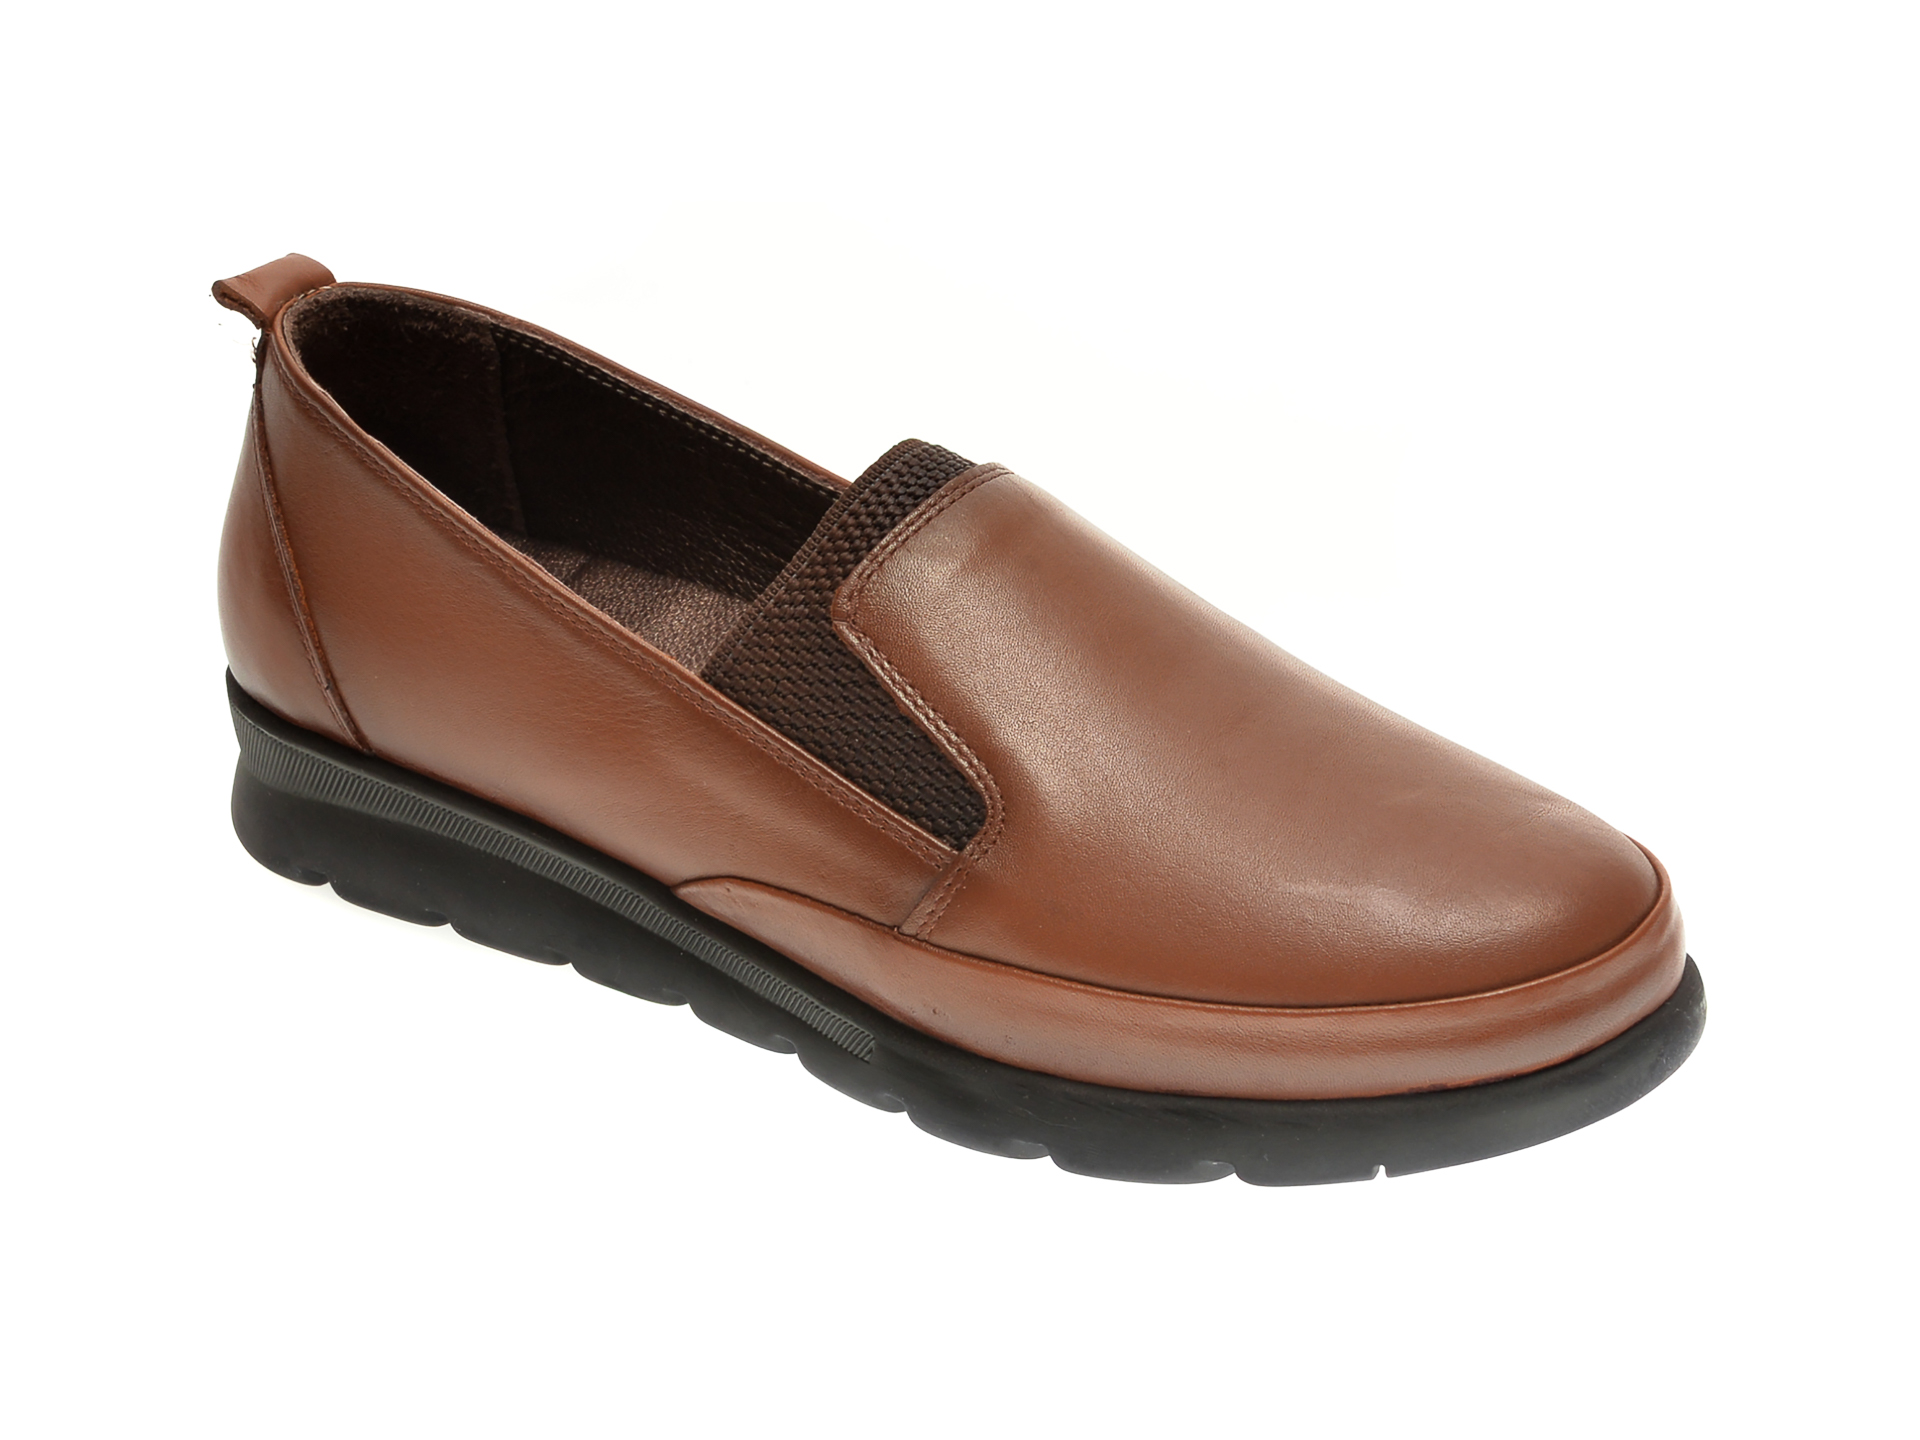 Pantofi ILOZ maro, 740, din piele naturala imagine